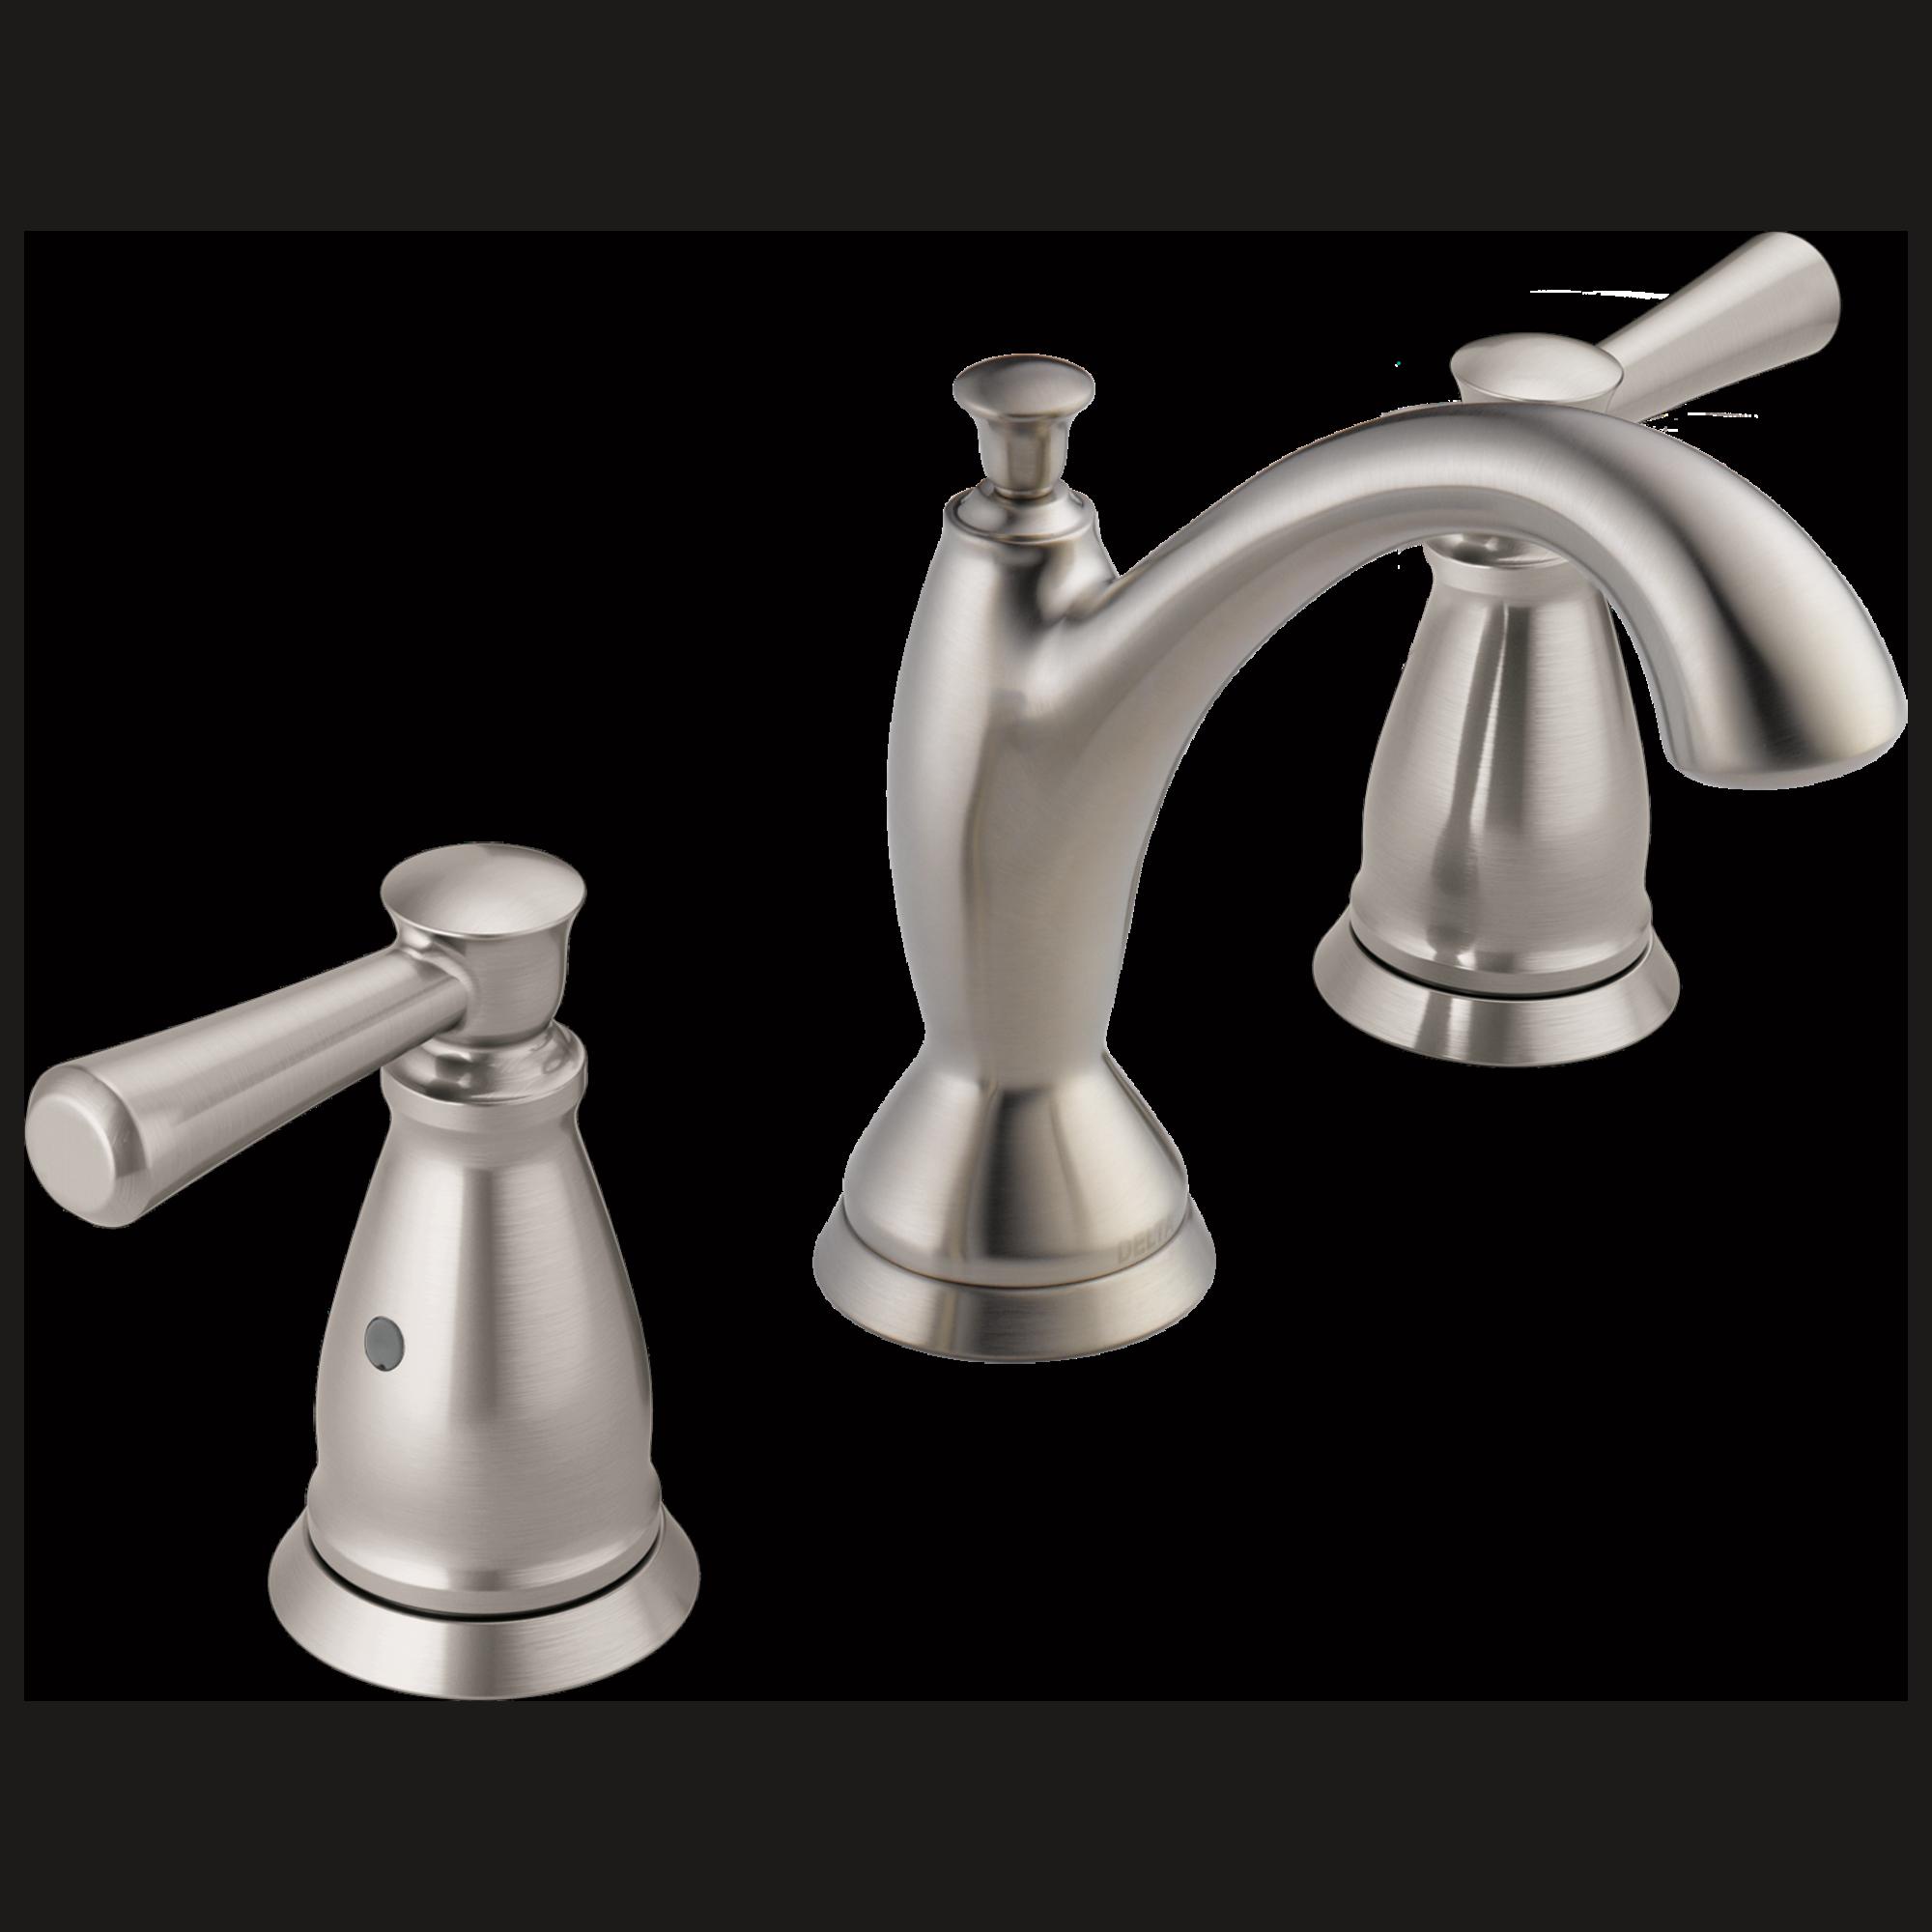 Delta 3559 Mpu Delta Faucets Widespread Bathroom Faucet Bathroom Faucets